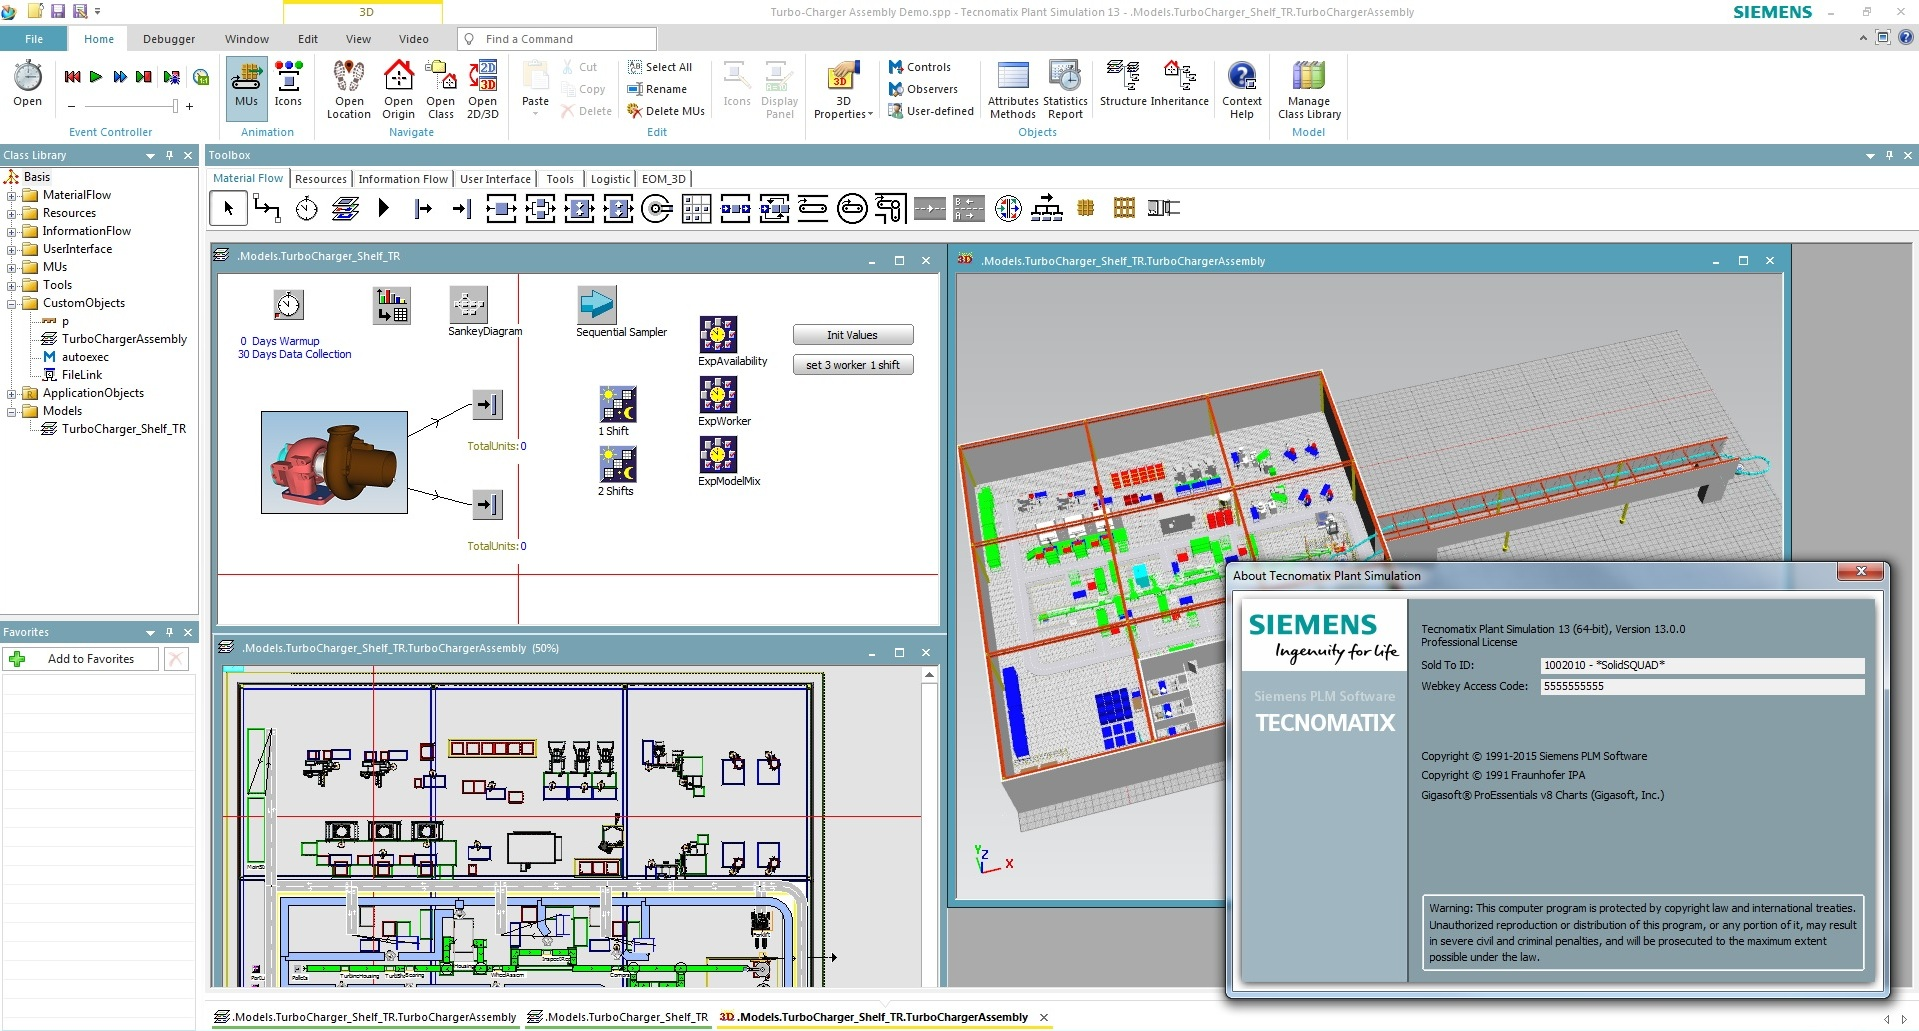 Working with Siemens Tecnomatix Plant Simulation 13.0 Win64